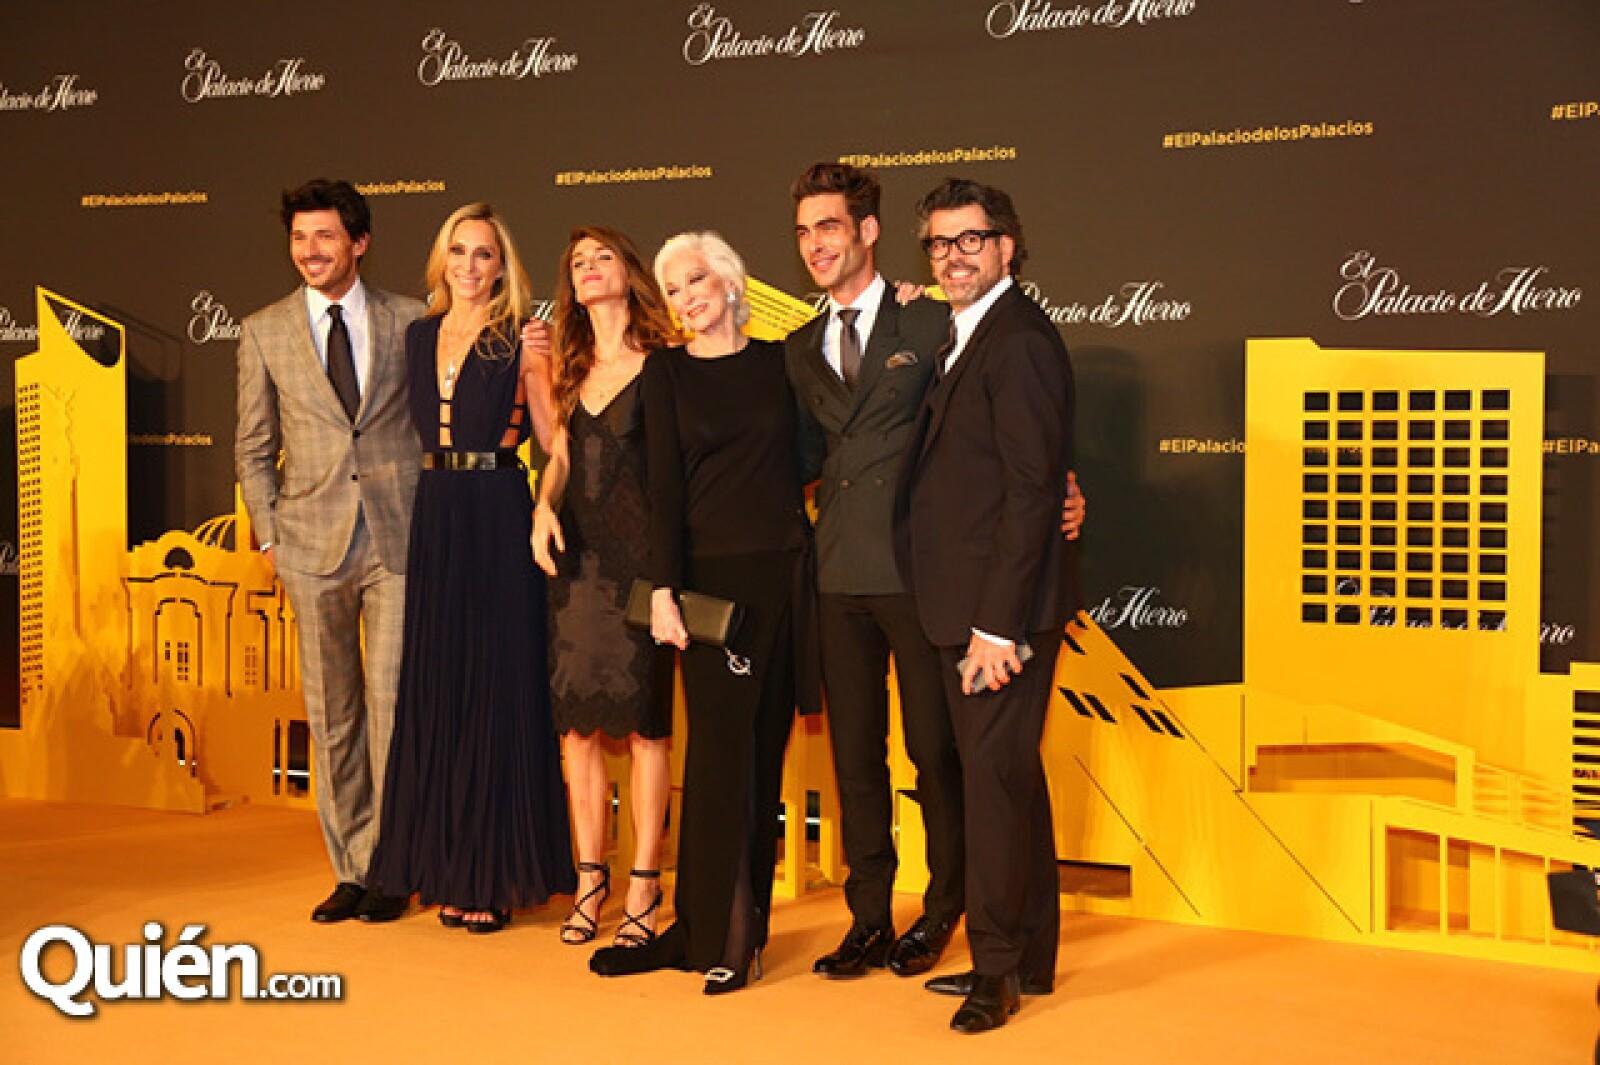 Andrés Velencoso,Francoise Lavertu,Elisa Cednauri,Carmen Dell`Orefice,Jon Kortajarena,Carlos Salcido